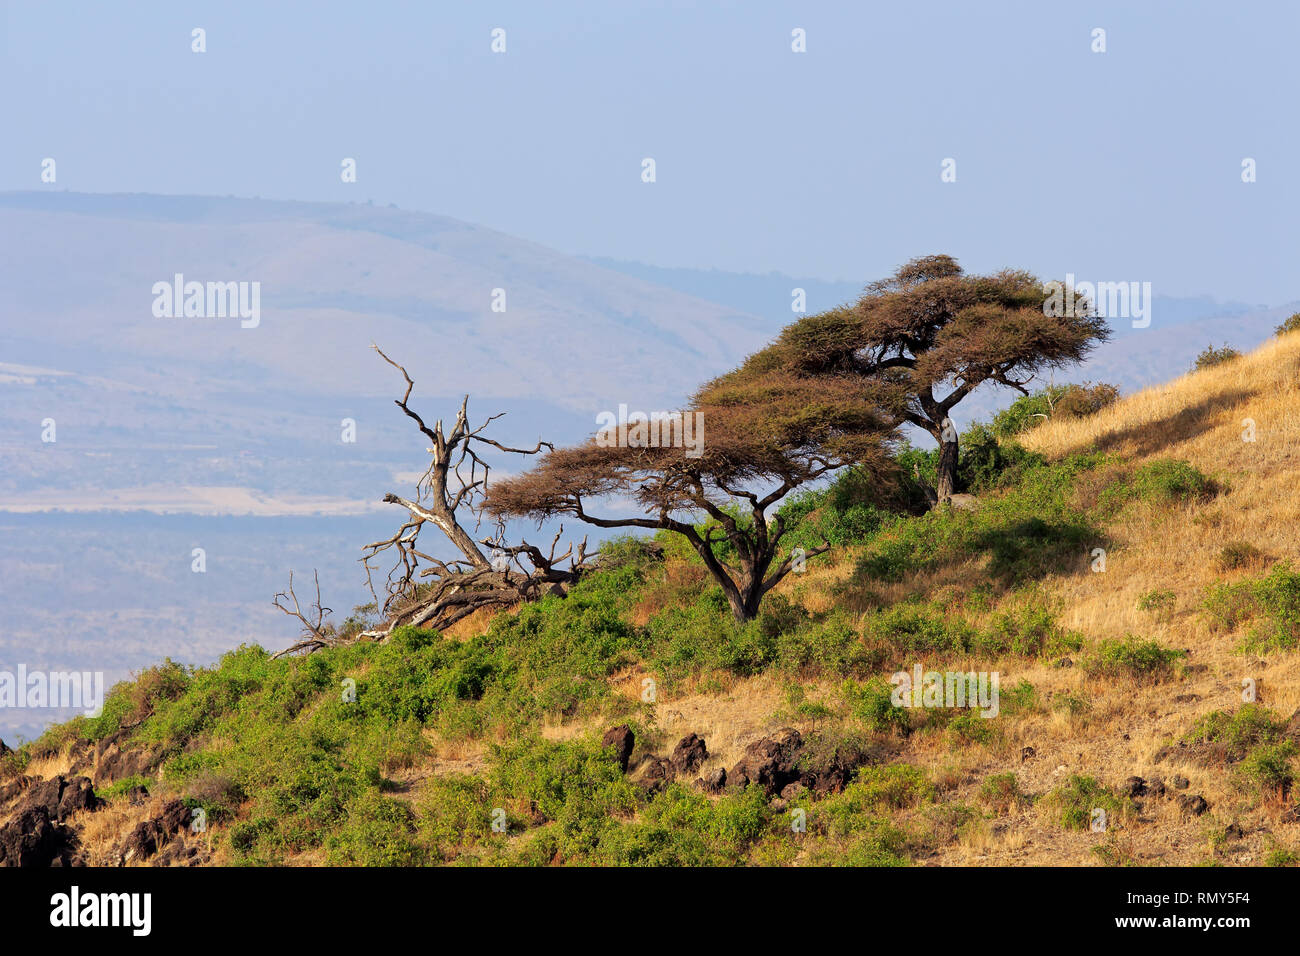 Landscape with African thorn-trees, Amboseli National Park, Kenya - Stock Image